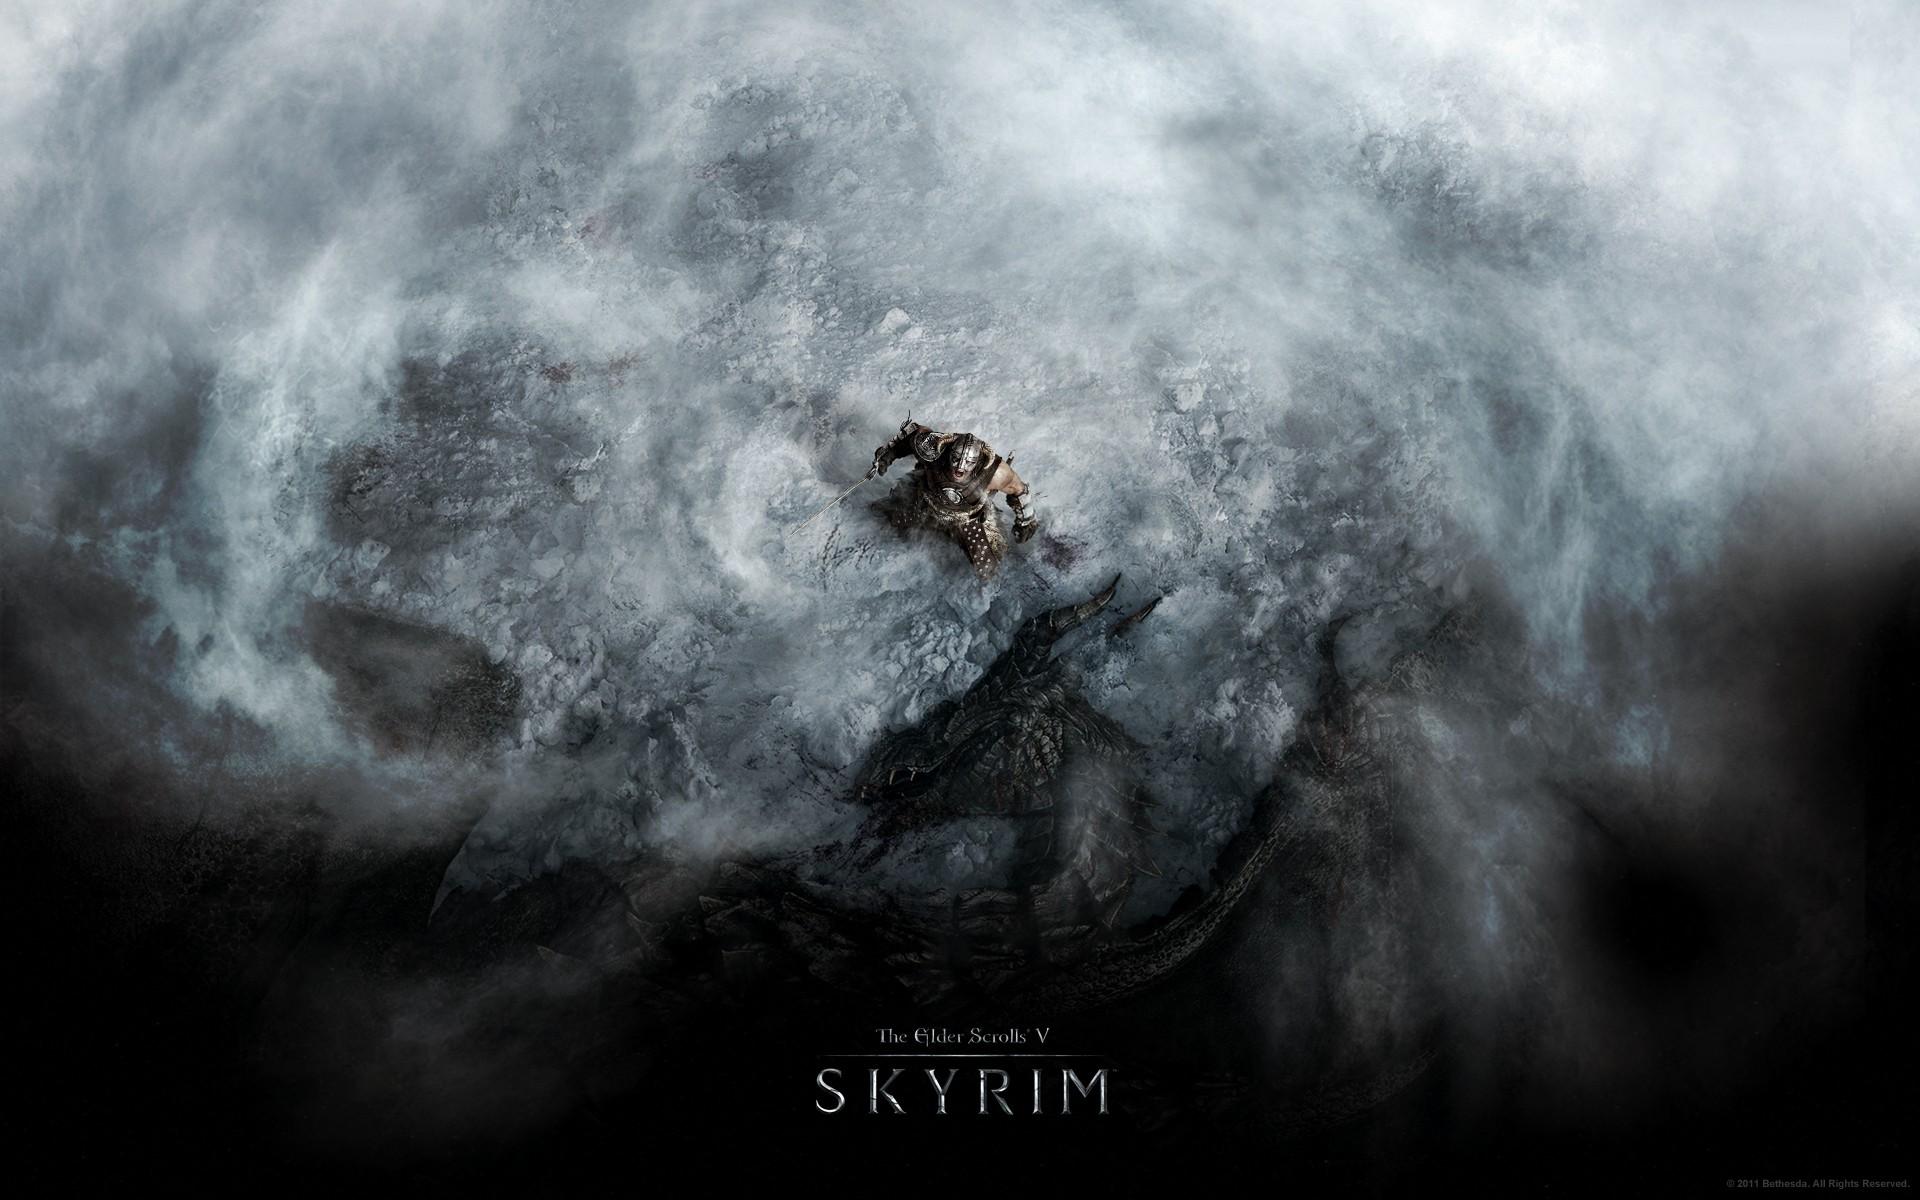 General 1920x1200 The Elder Scrolls V: Skyrim dragon video games snow fantasy art